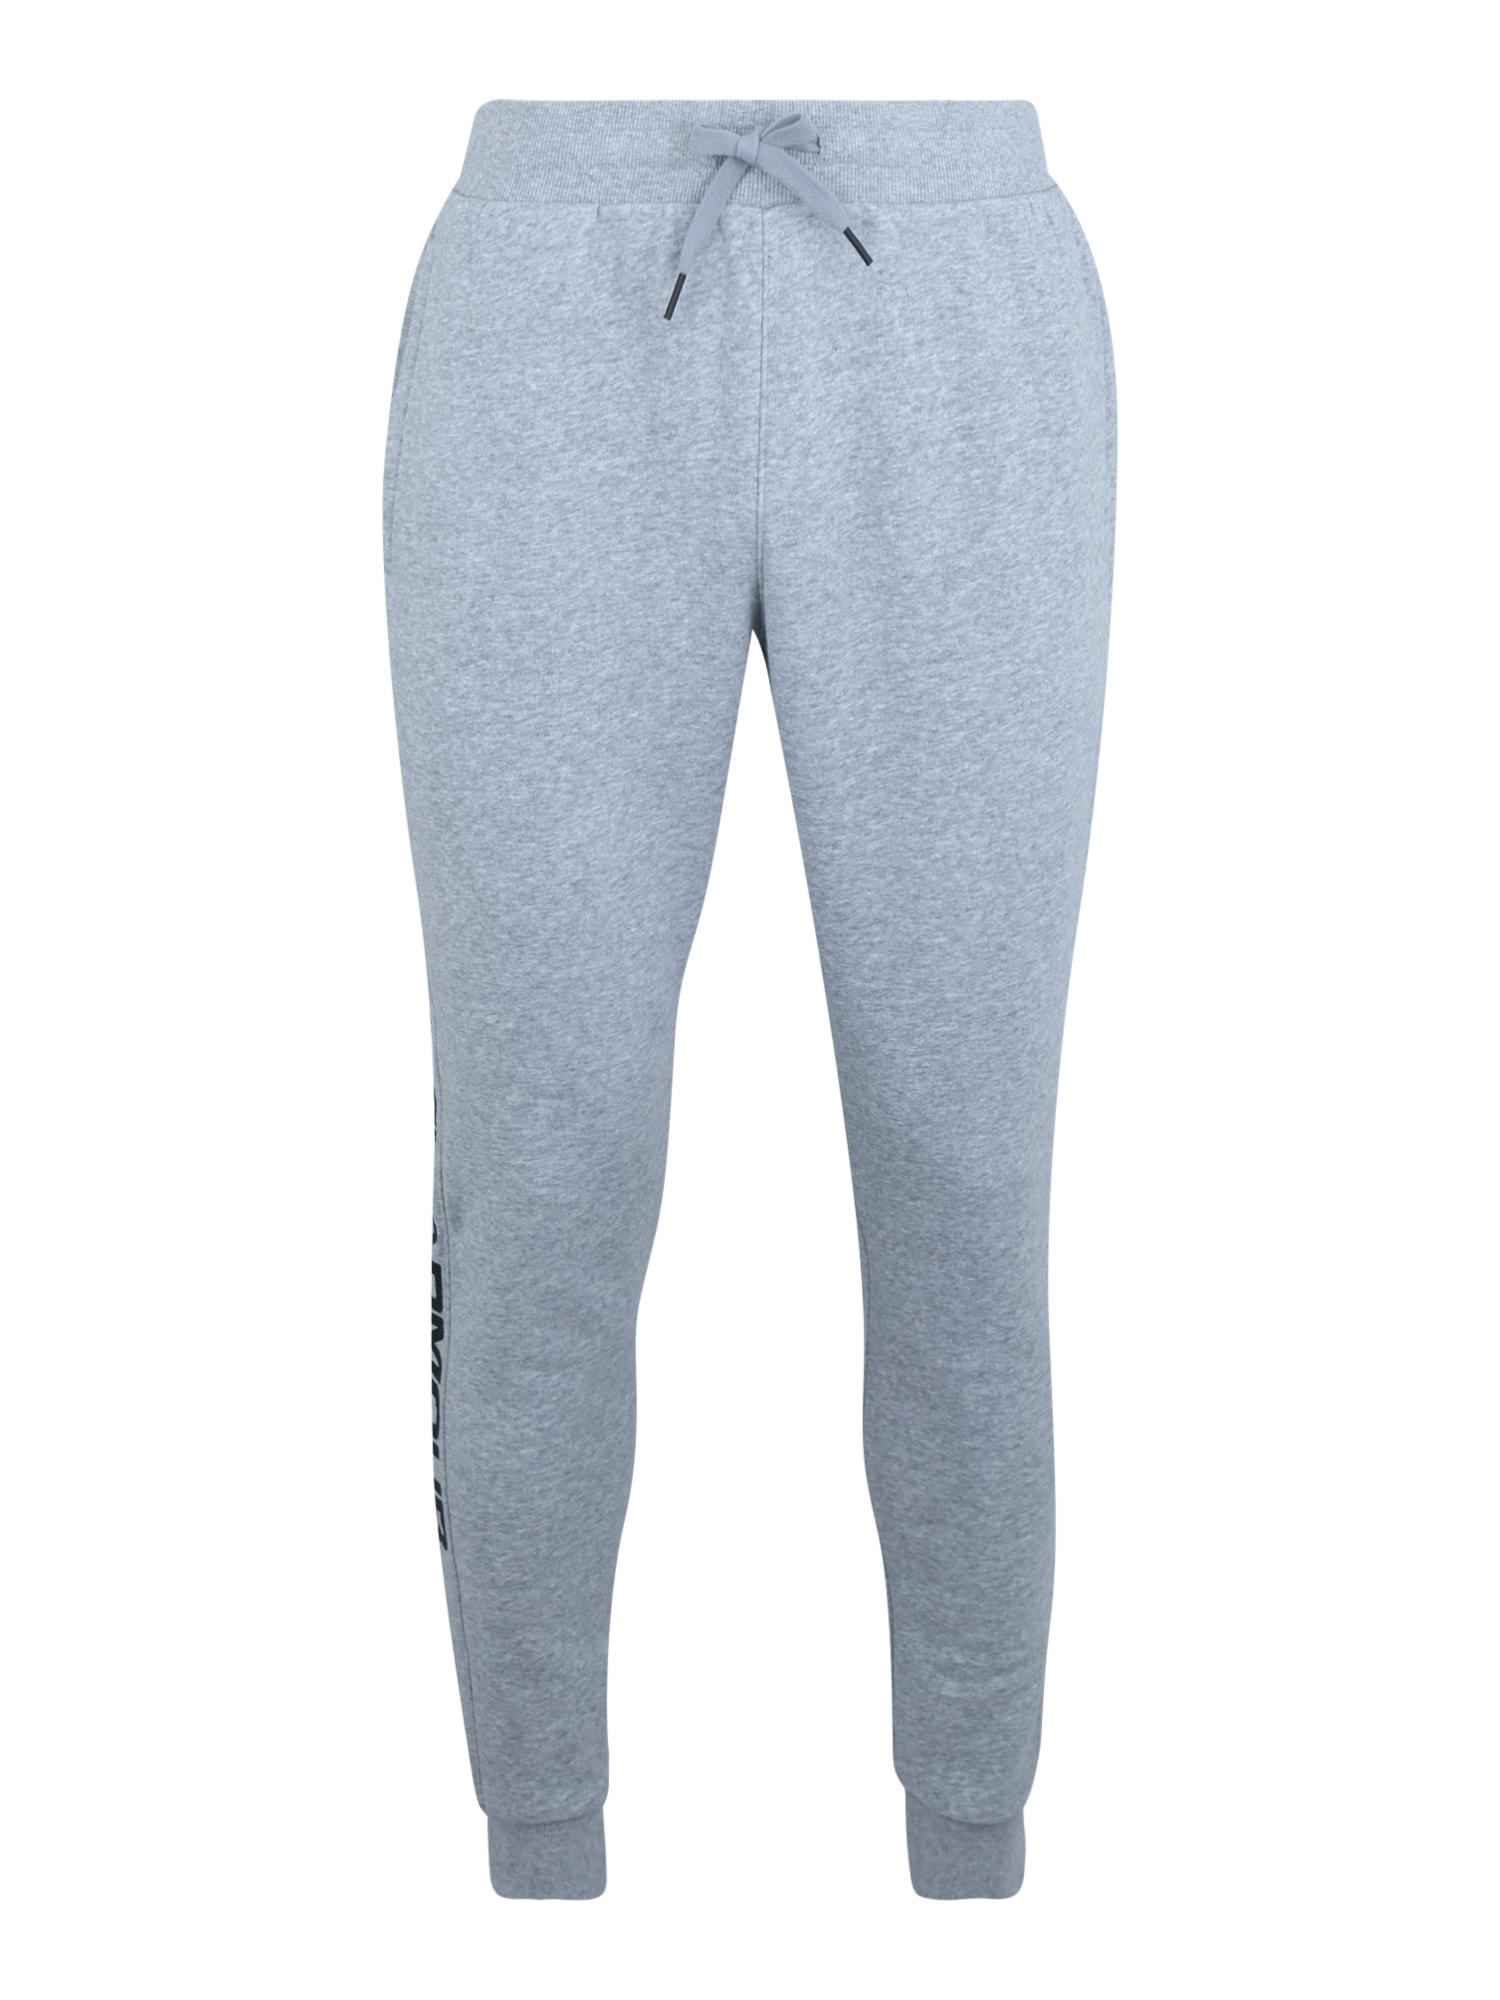 UNDER ARMOUR Športové nohavice 'RIVAL FLEECE WORDMARK LOGO'  sivá melírovaná / čierna